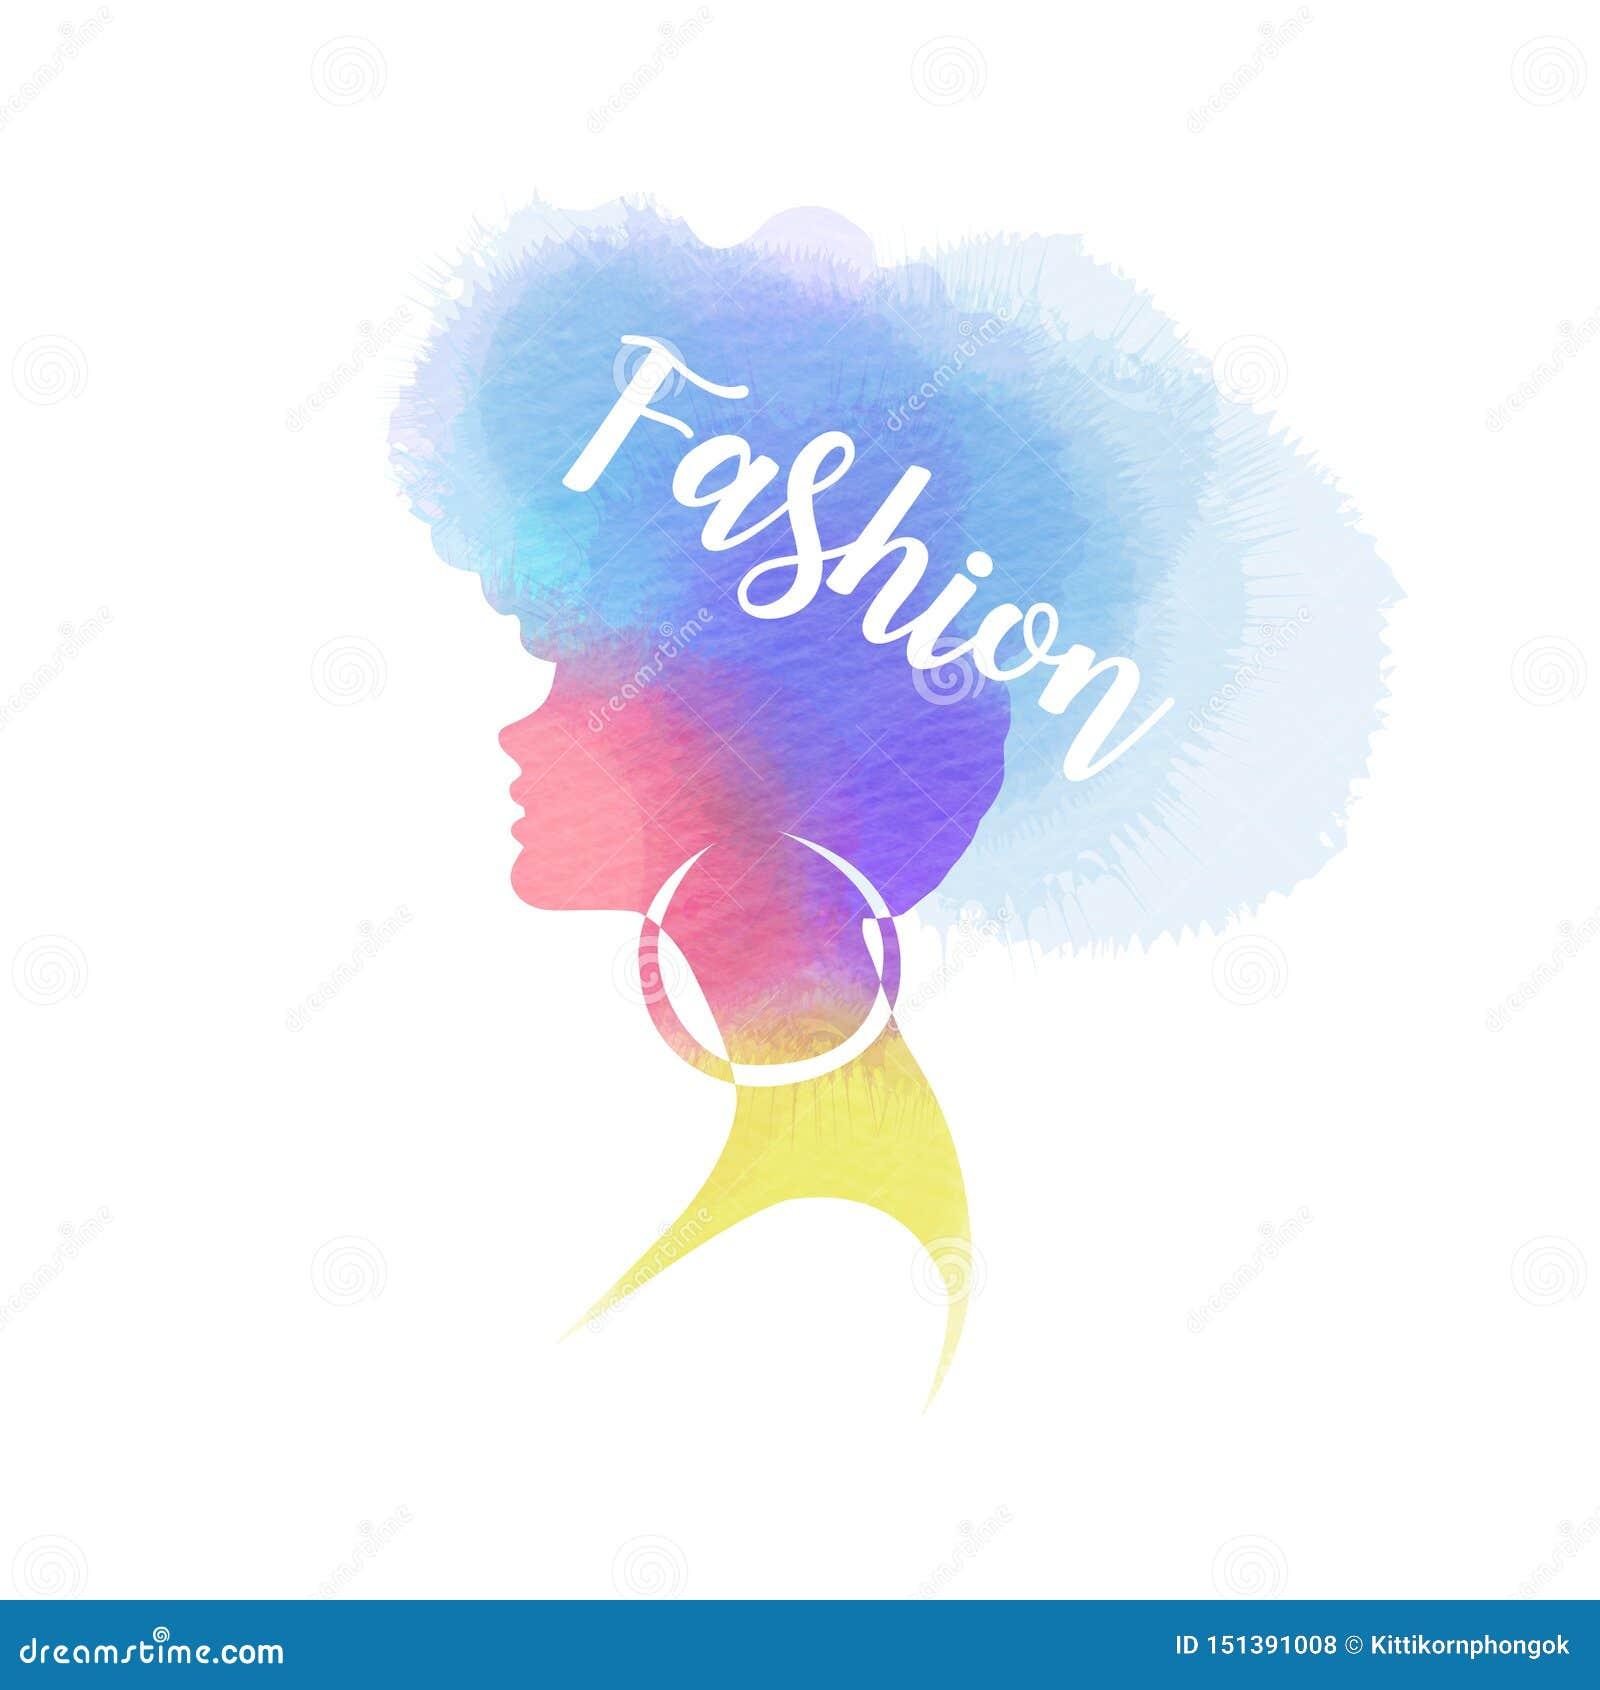 Illustration of woman beauty salon silhouette plus abstract watercolor. Fashion logo. Digital art painting. Vector illustration